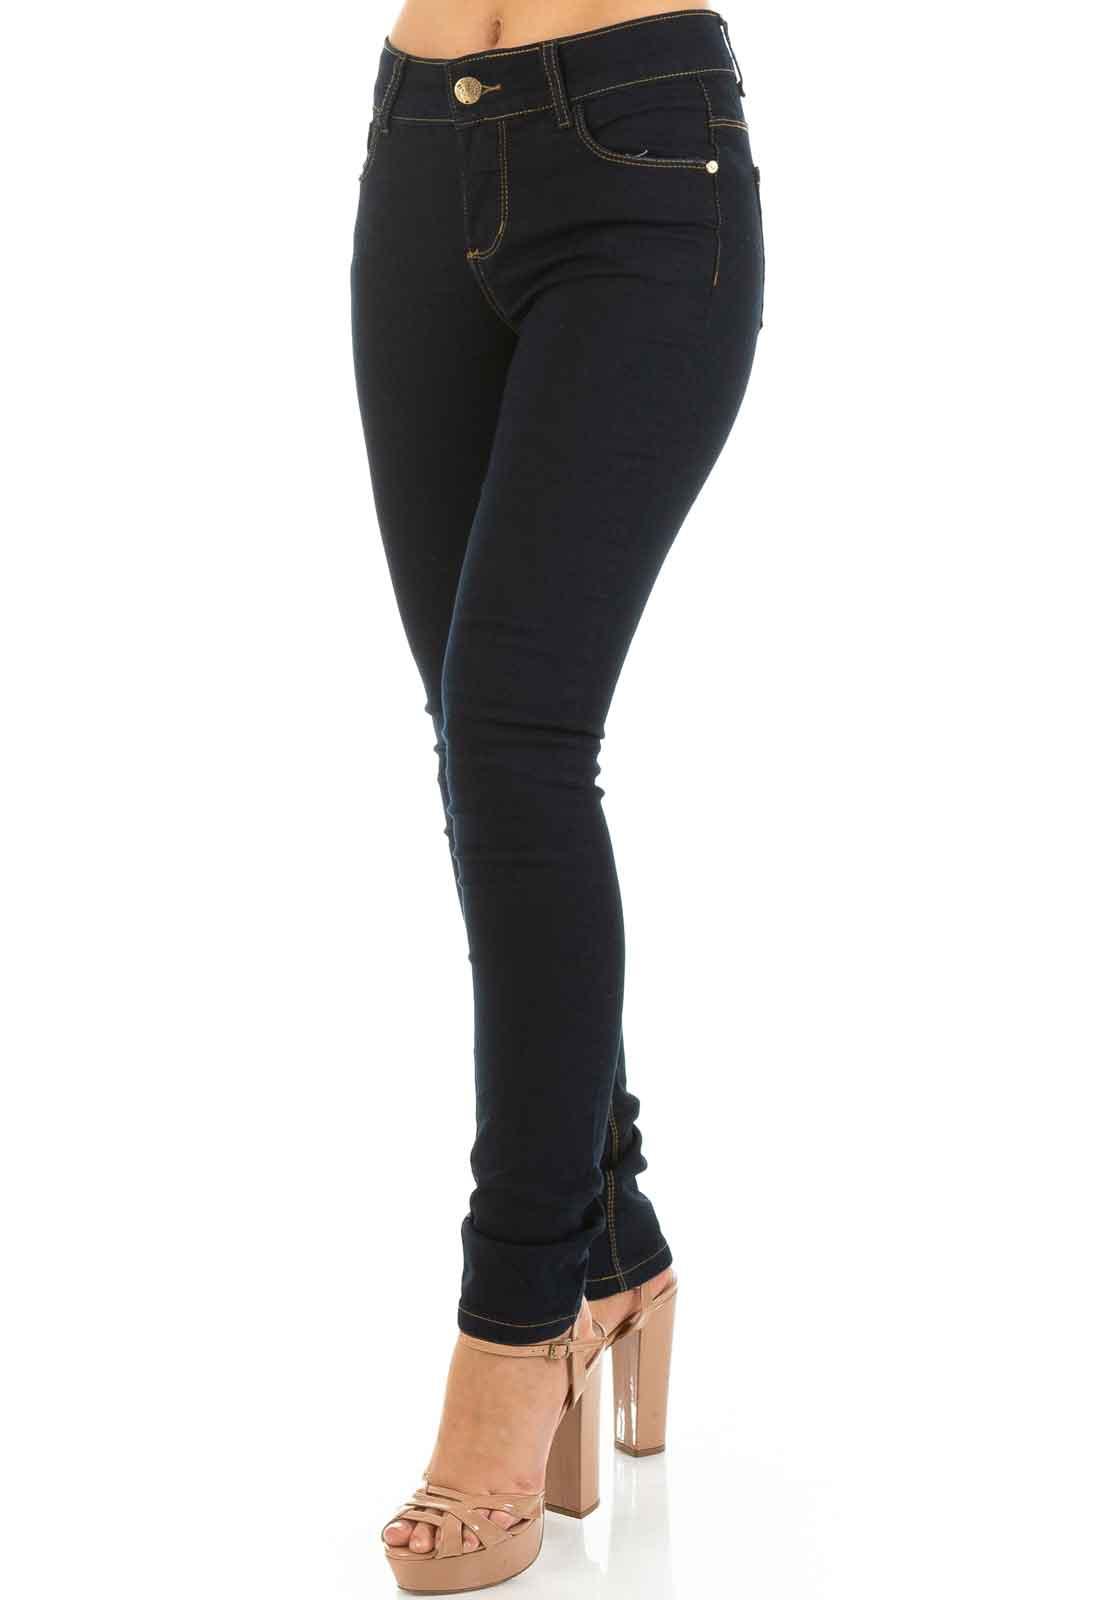 b266f59ad Calça Jeans Feminina Cintura Alta Skinny Azul Marinho - Dioxes Jeans